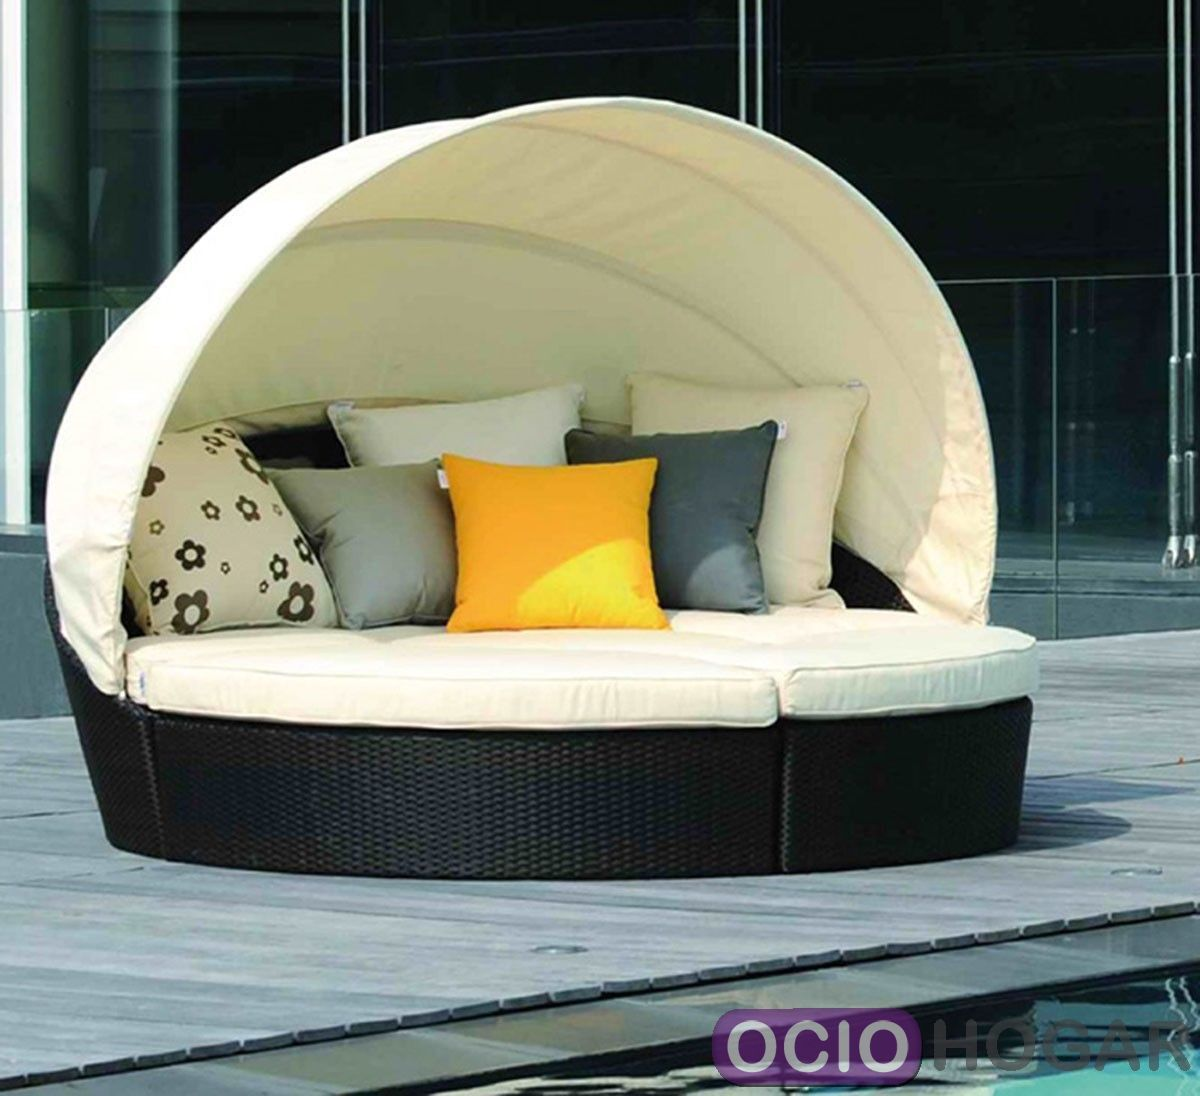 Tumbona modular baleares de majestic garden - Tumbona exterior ...